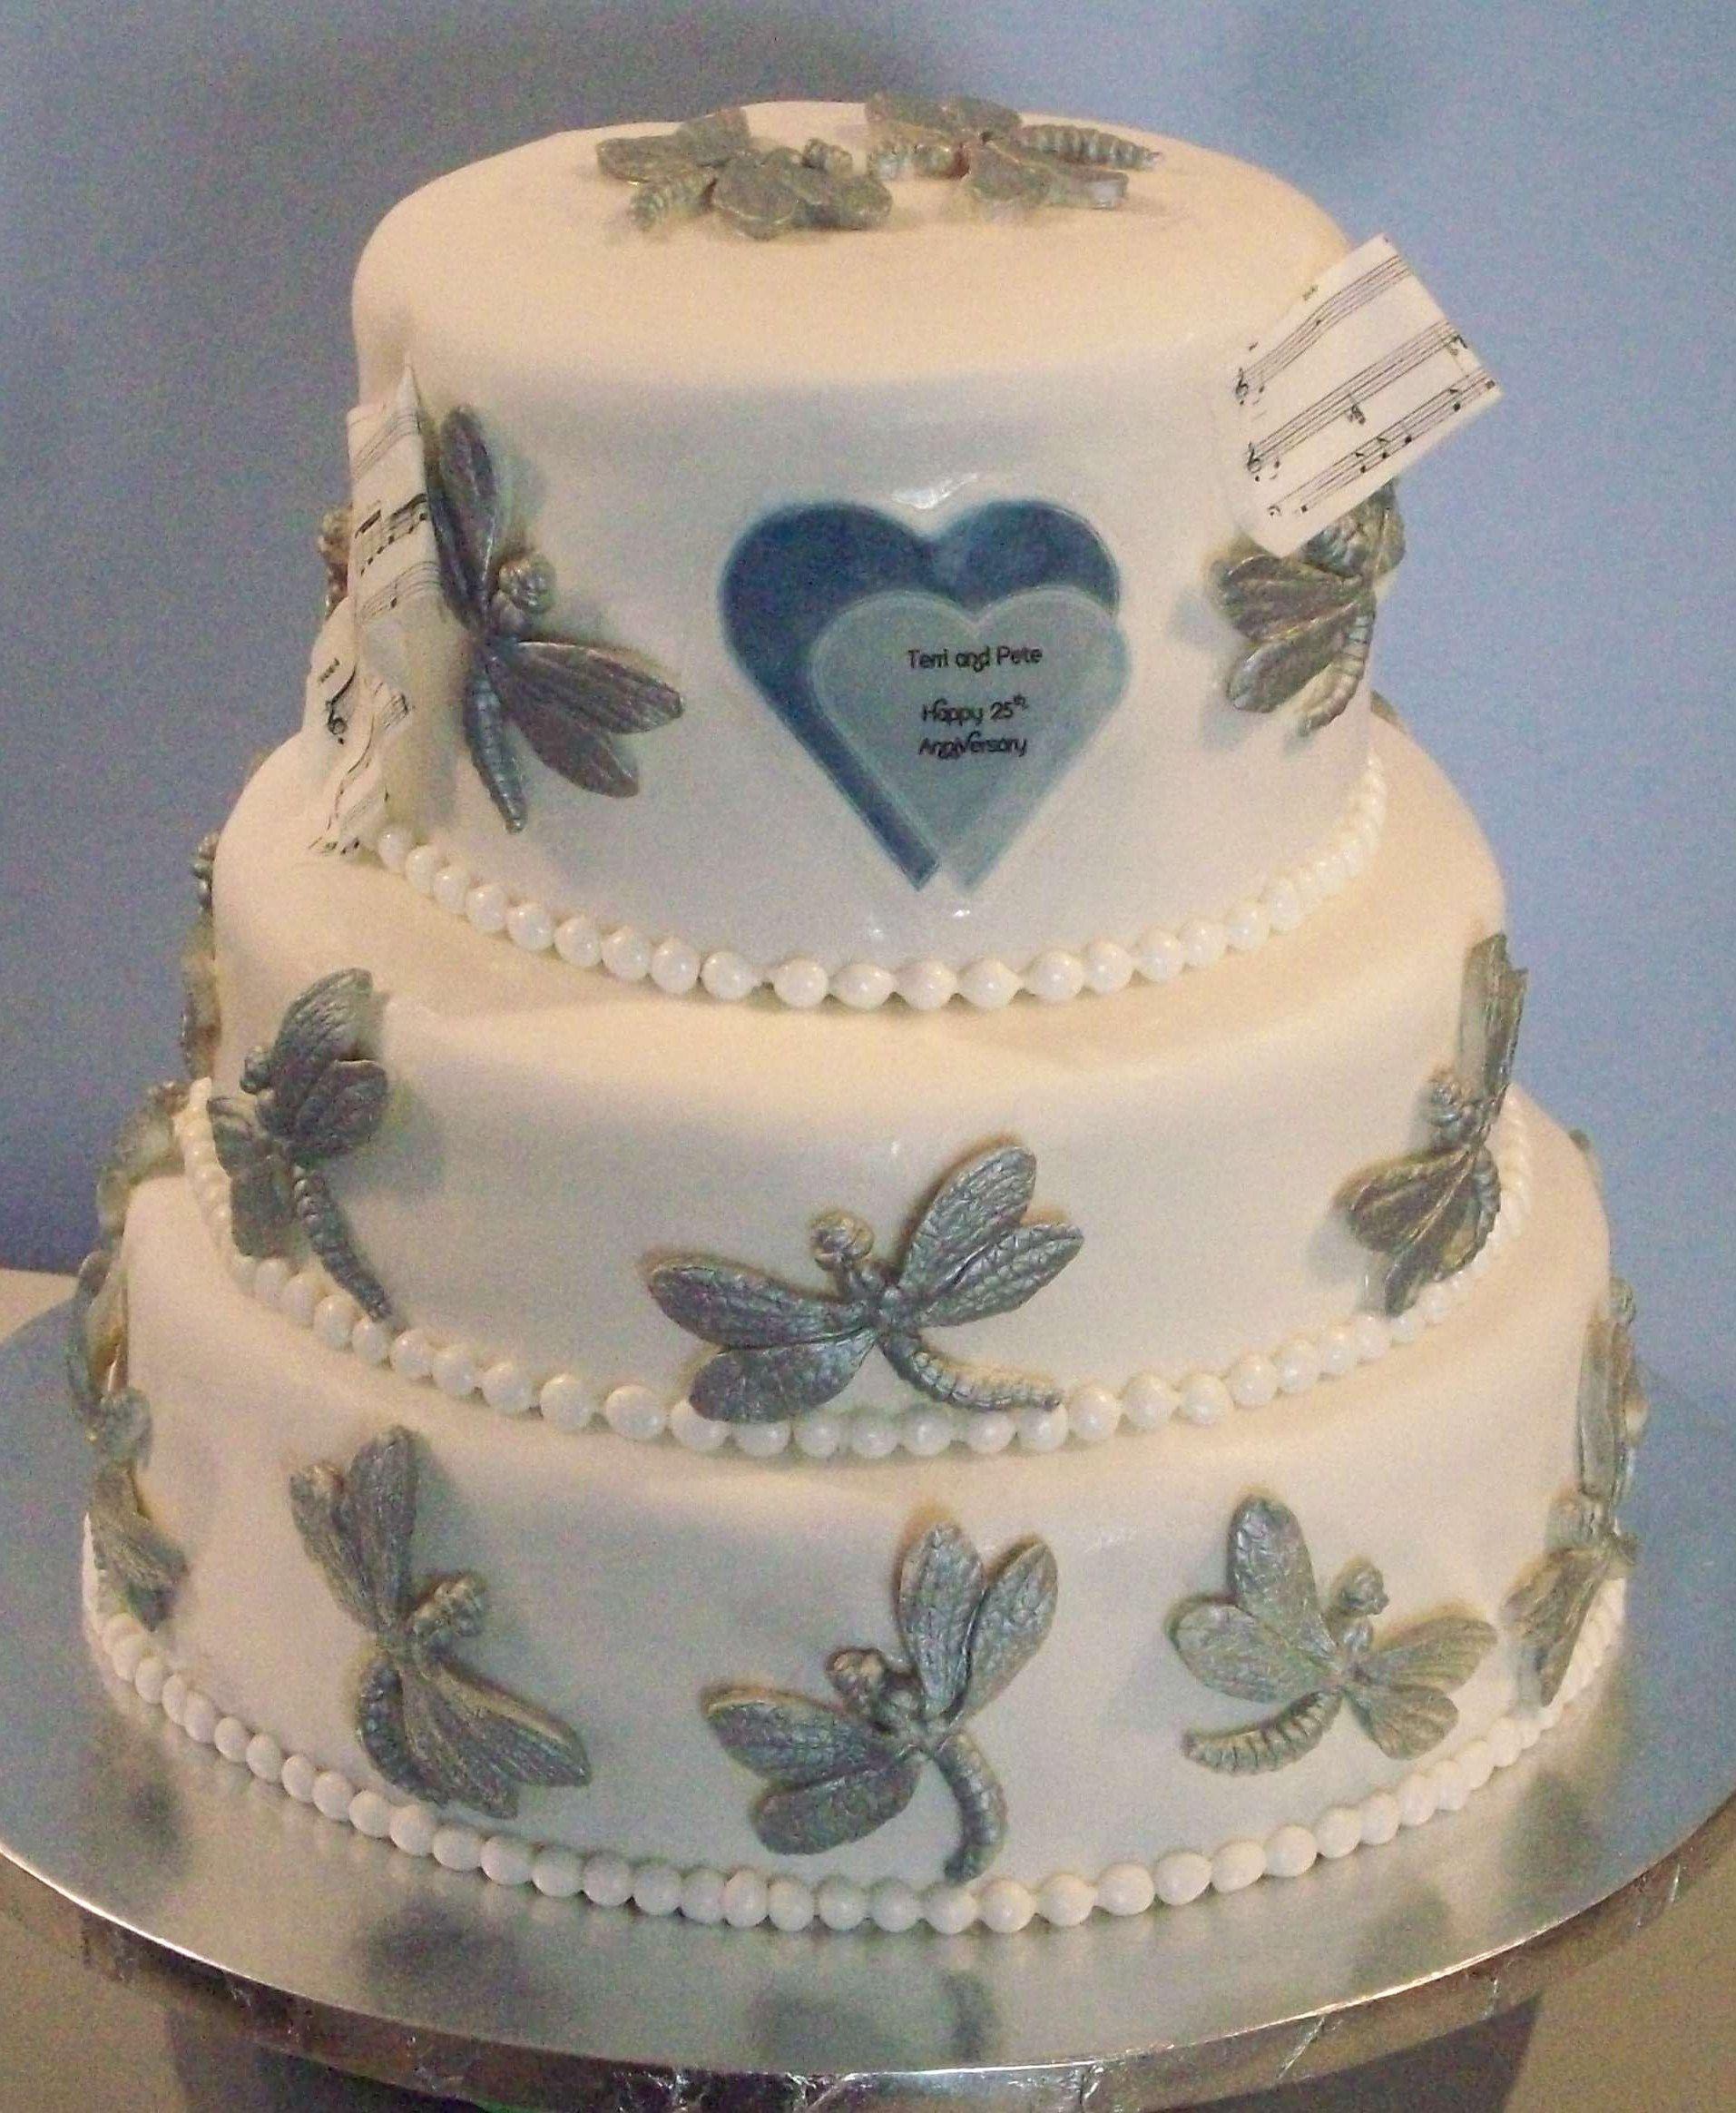 25th Wedding Anniversary Cake Ideas: Smoochies Creations -25th Wedding Anniversary Cake With 25